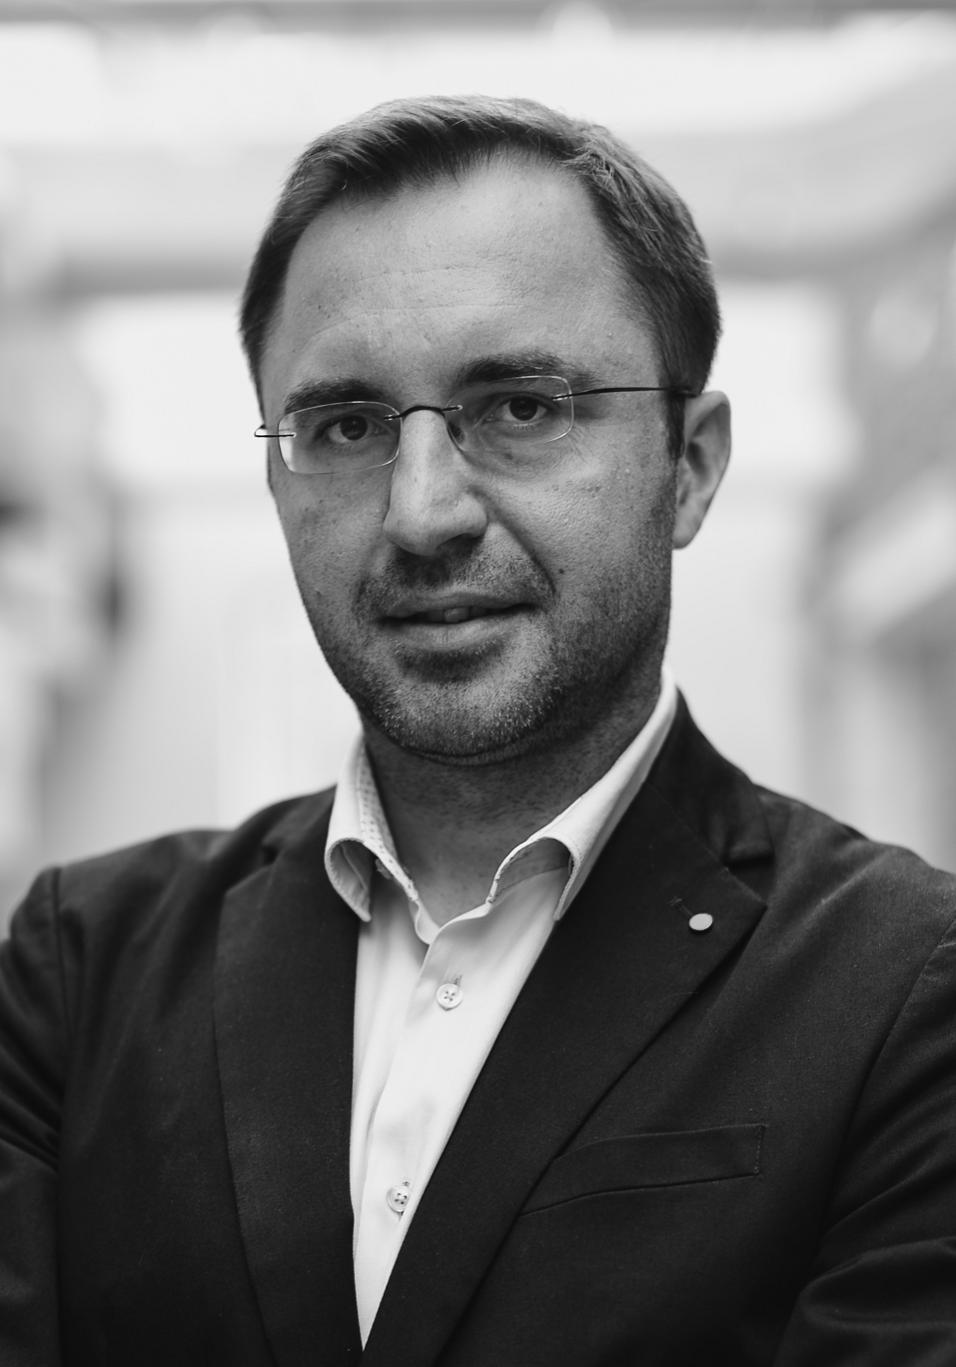 MARCIN ZARZECKI - Quotiss freight quote - Founder, CEO